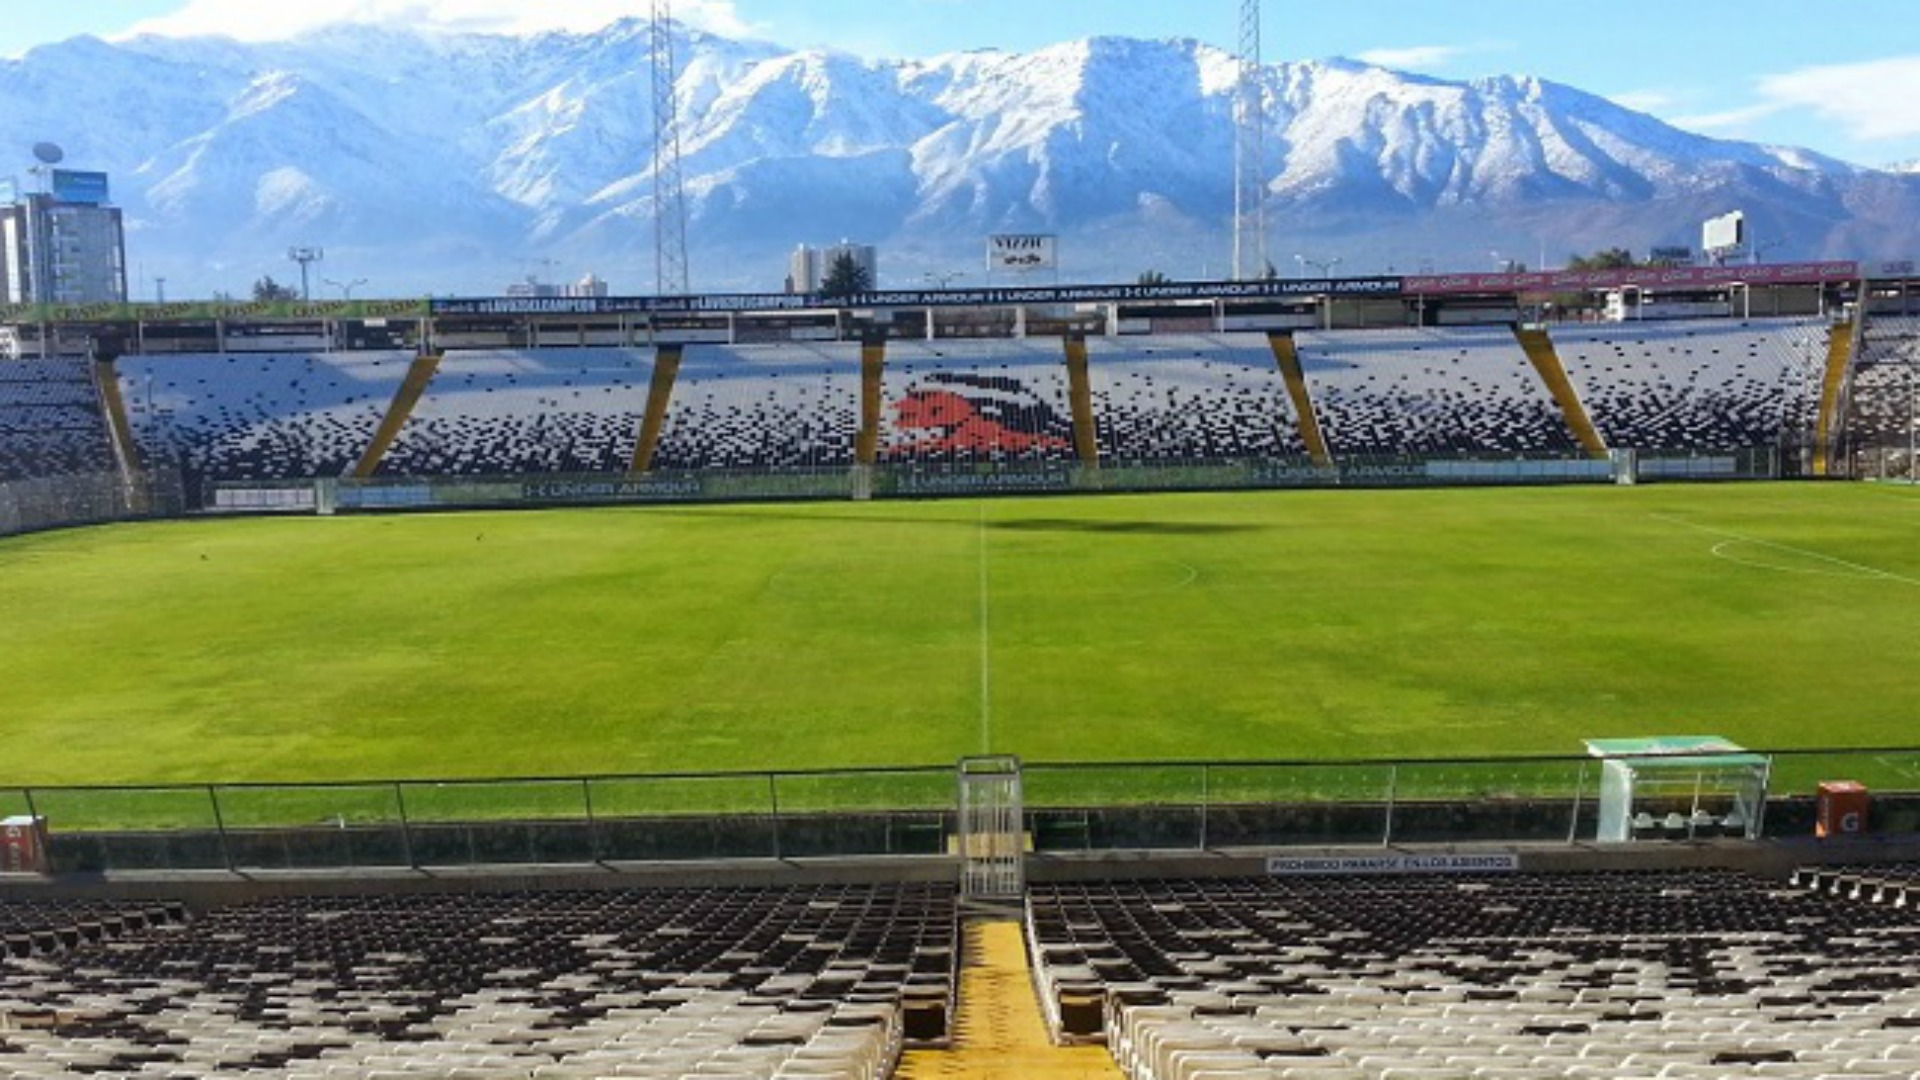 Estadio Monumental fue evacuado por amenaza de bomba   Goal.com